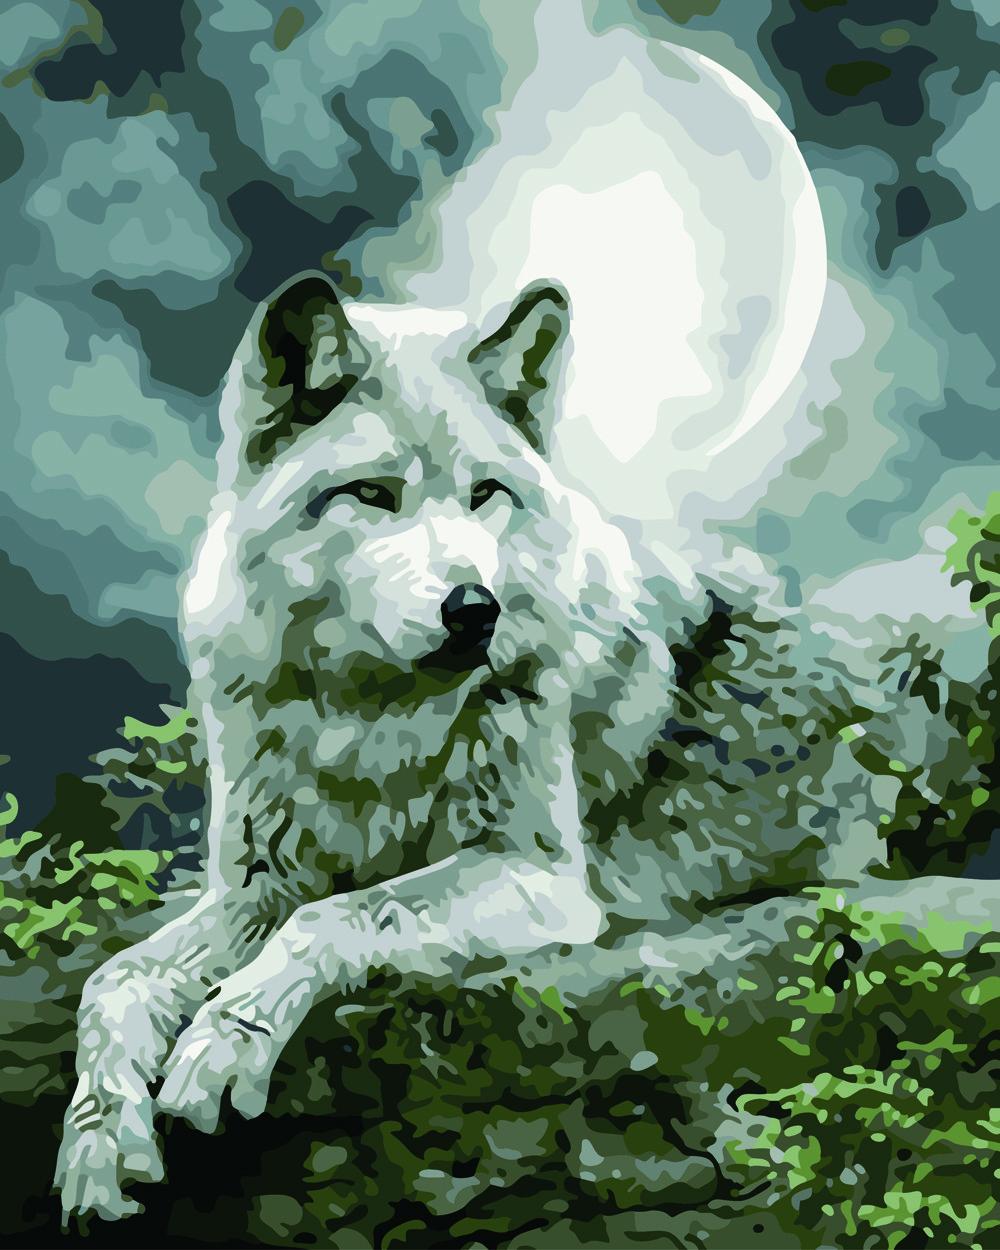 Картина по номерам Серый призрак 40 х 50 см (BK-GX21058)